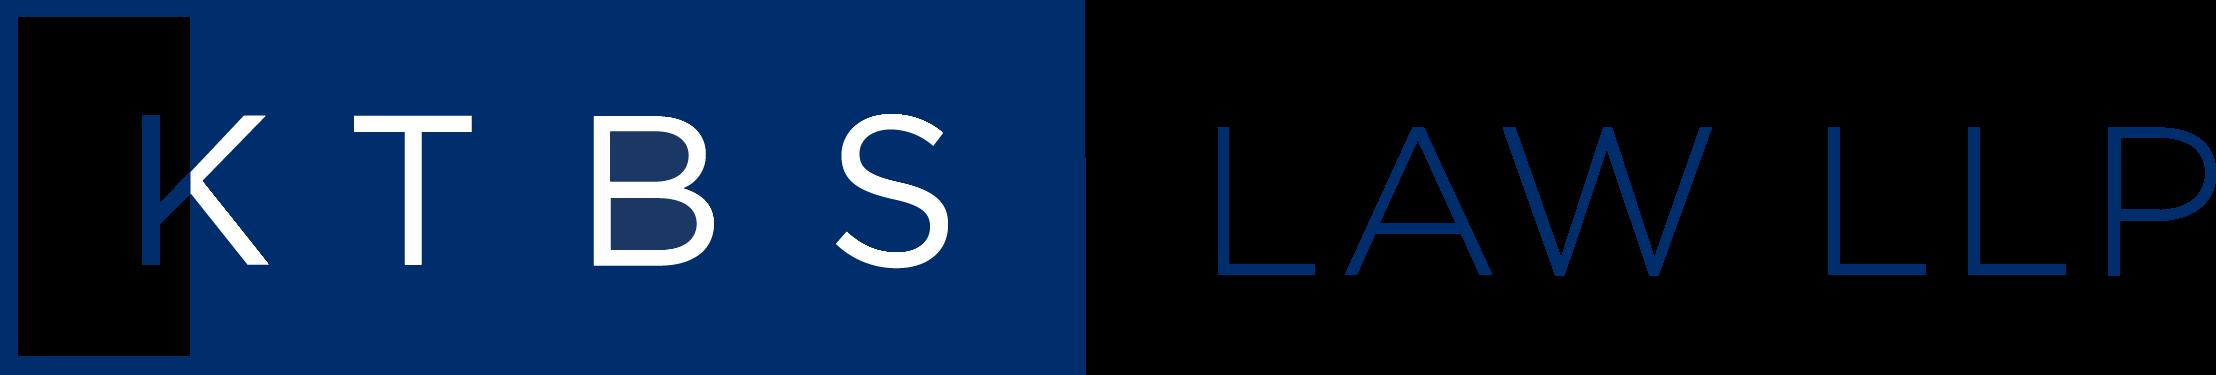 KTBS Law LLP